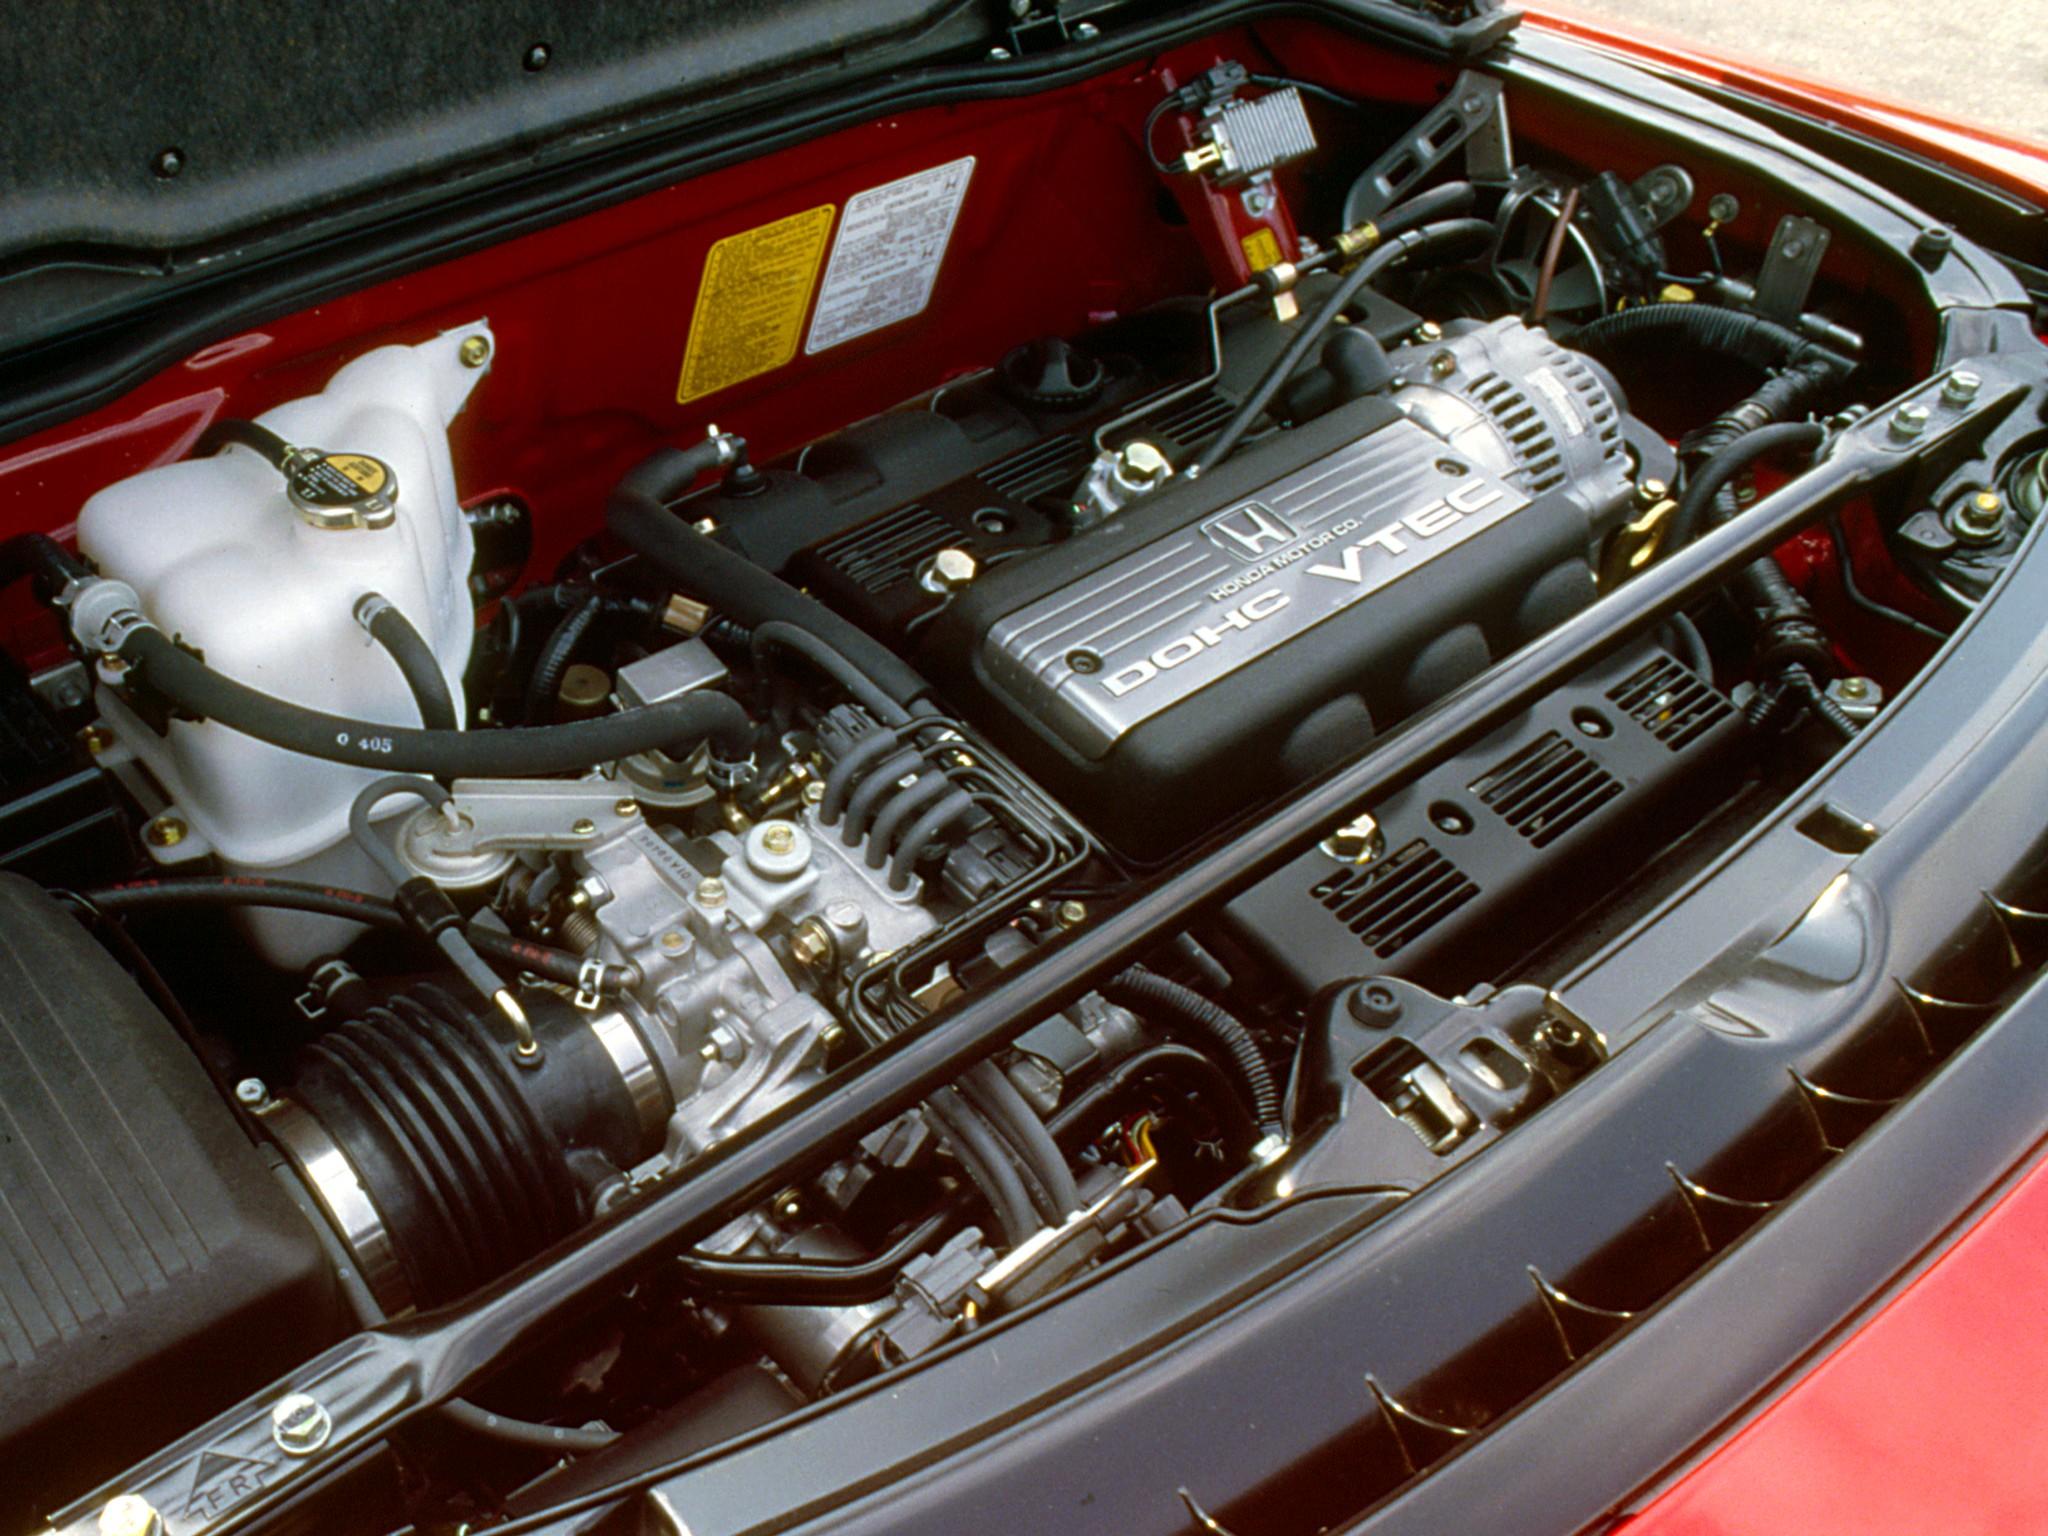 1990aei2001 honda nsx eu spec na1 supercar supercars engine 1990aei2001 honda nsx eu spec na1 supercar supercars engine engines f wallpaper 2048x1536 118036 wallpaperup voltagebd Gallery